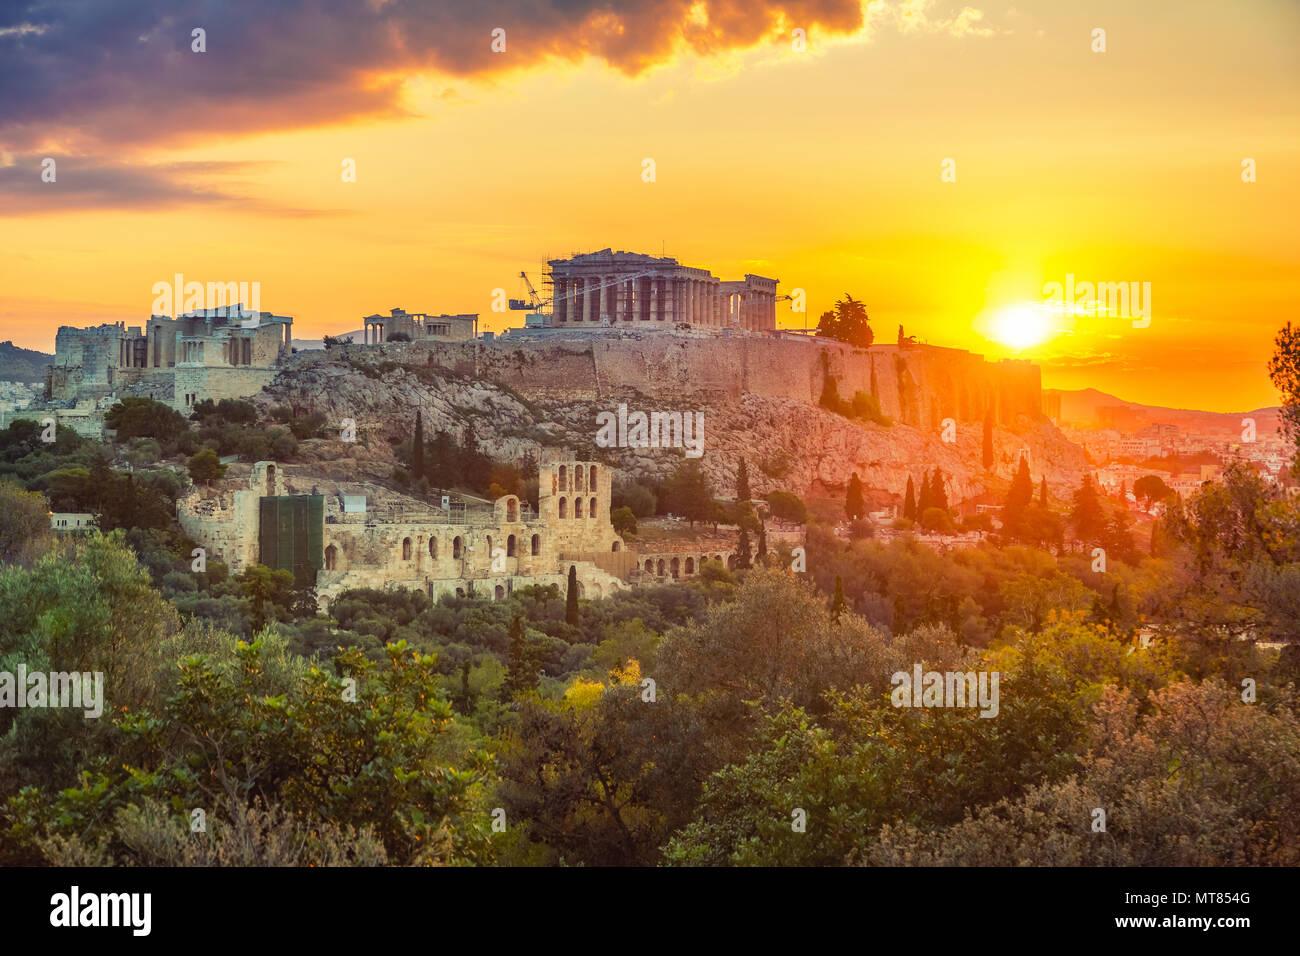 Sunrise over Parthenon, Acropolis of Athens, Greece - Stock Image